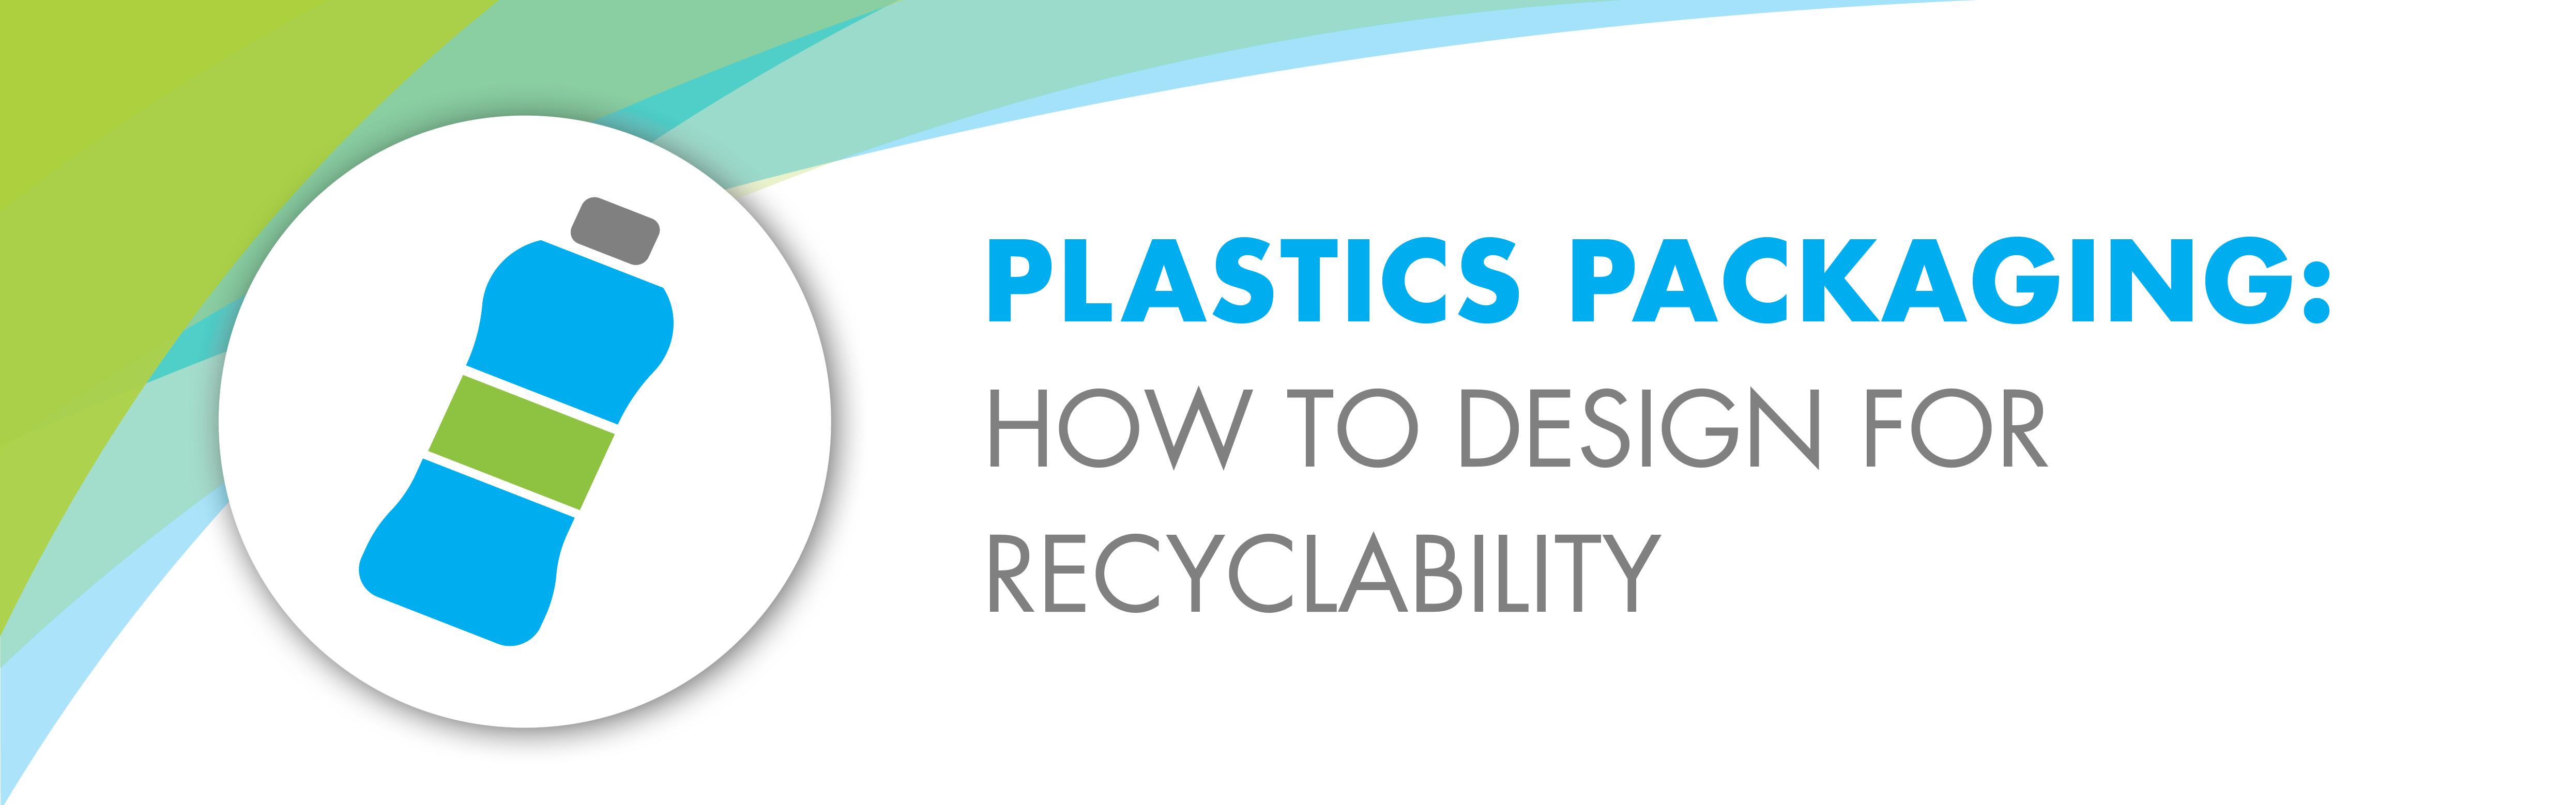 Plastics Packaging image blog